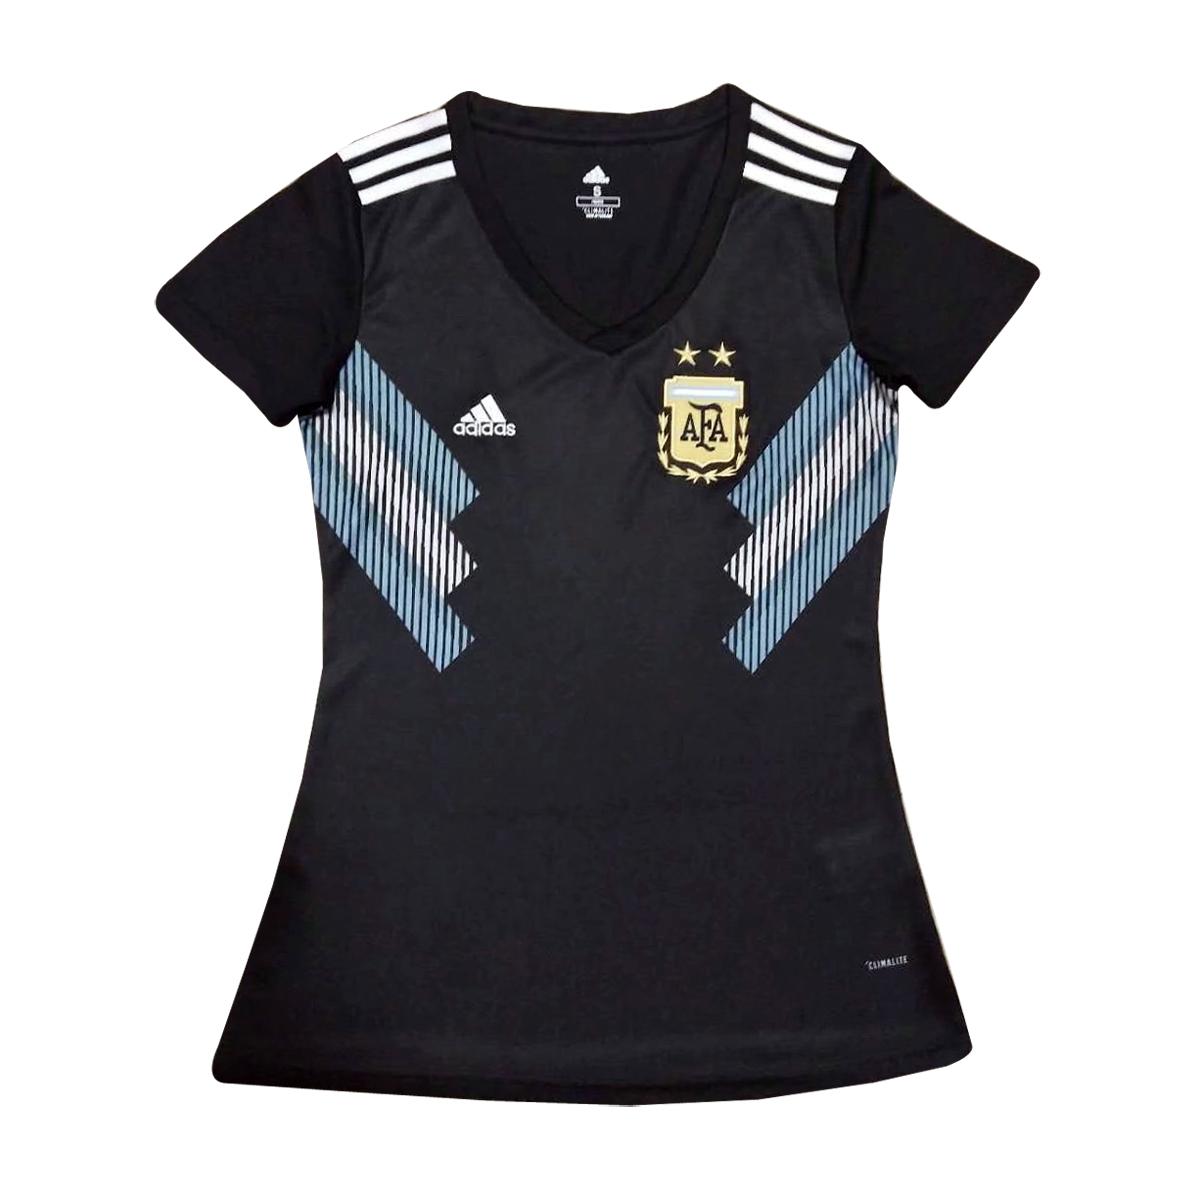 Jersey - Women Argentina Away World Cup Official 2018 Jersey Football Jersey  O. ‹ › 52853fa62